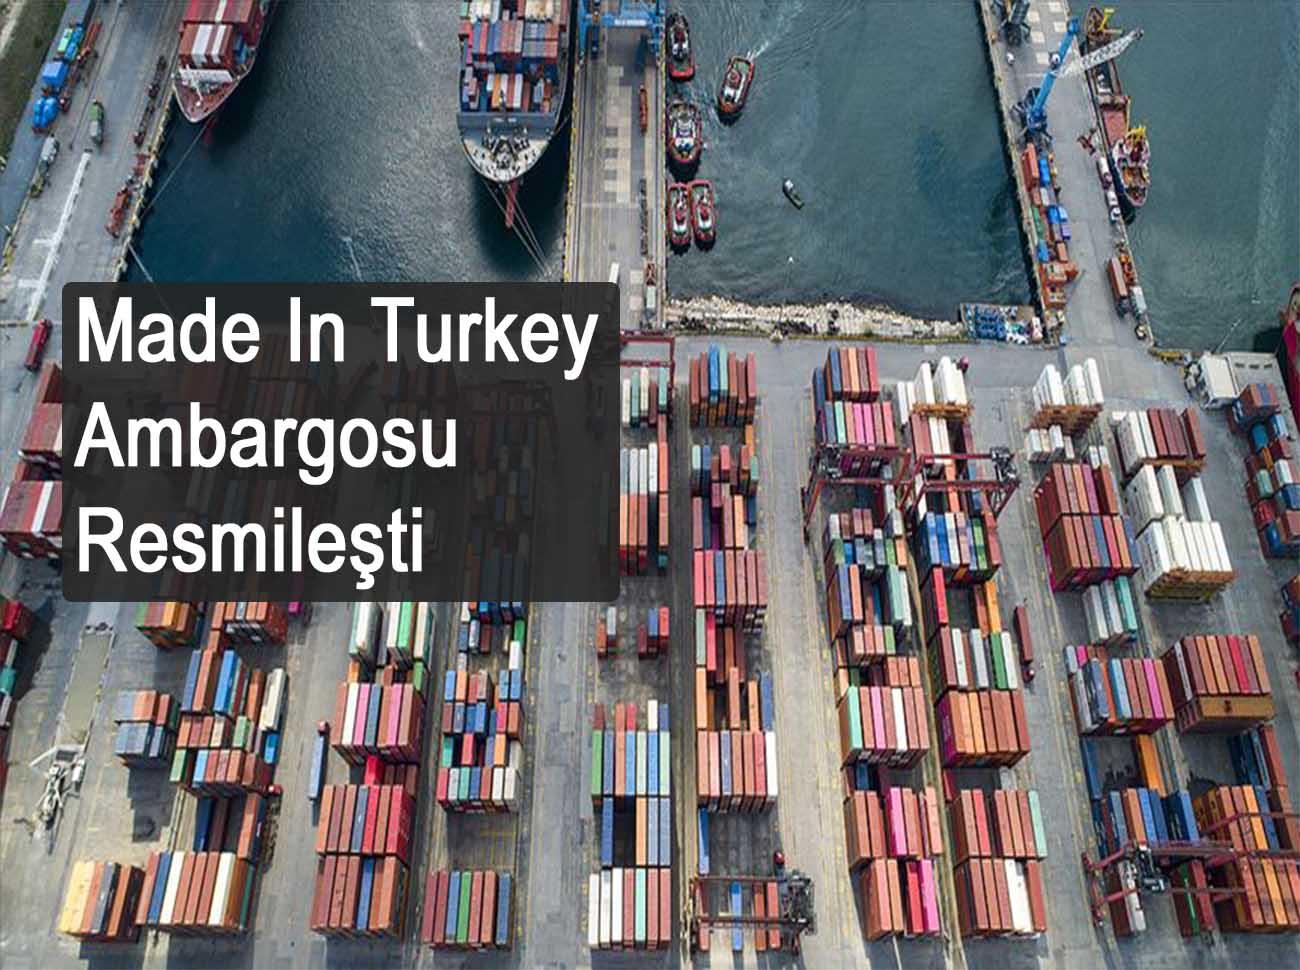 Suudi Arabistan'ın Made In Turkey Ambargosu Resmileşti